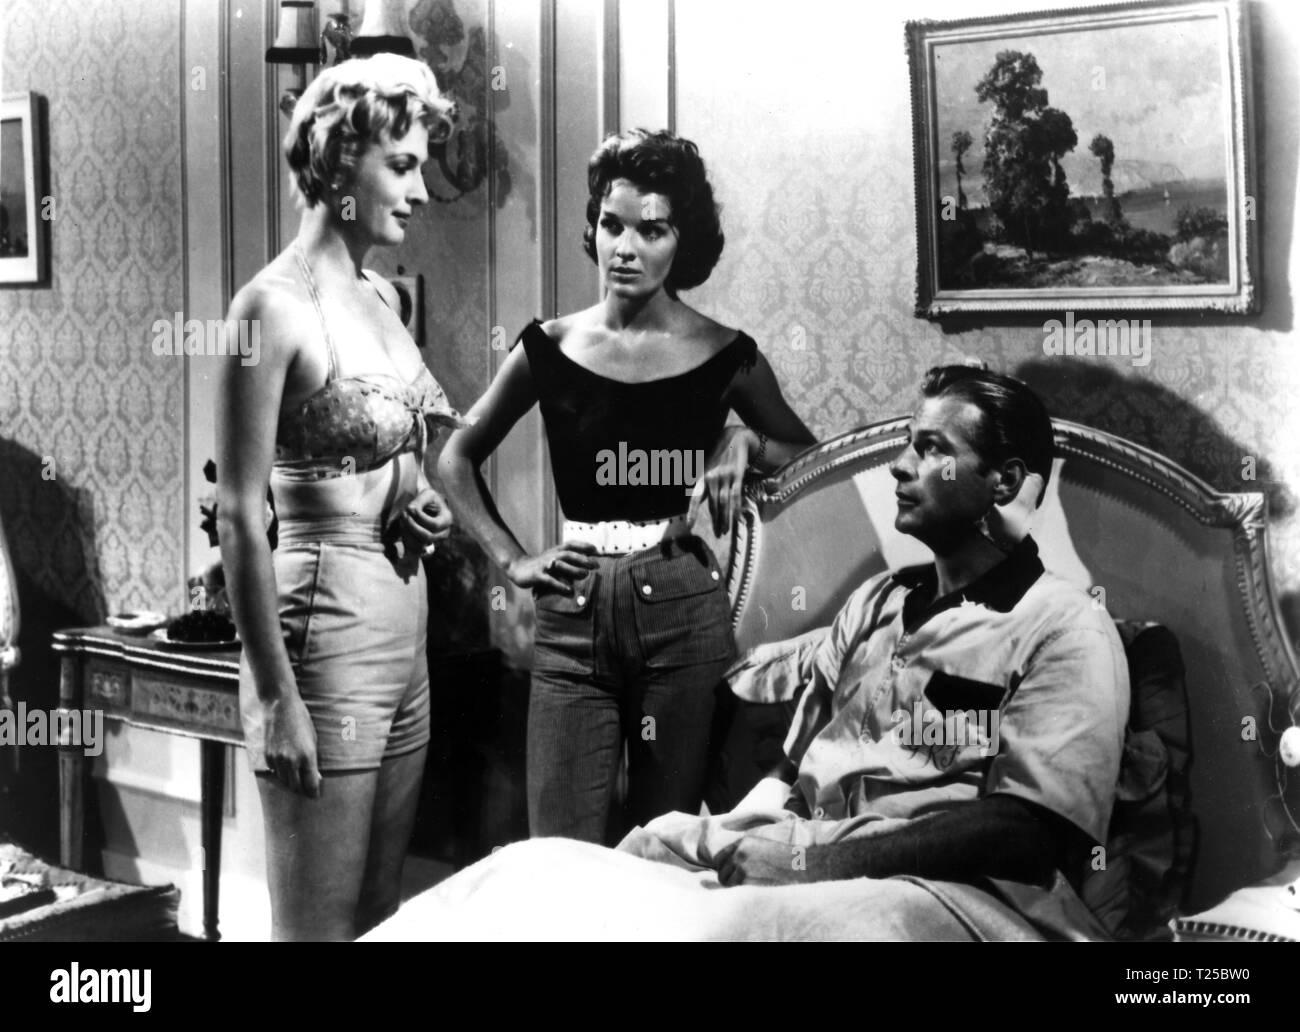 The Strange Awakening (1958) Lex Barker, Lisa Gastoni, Carole ...